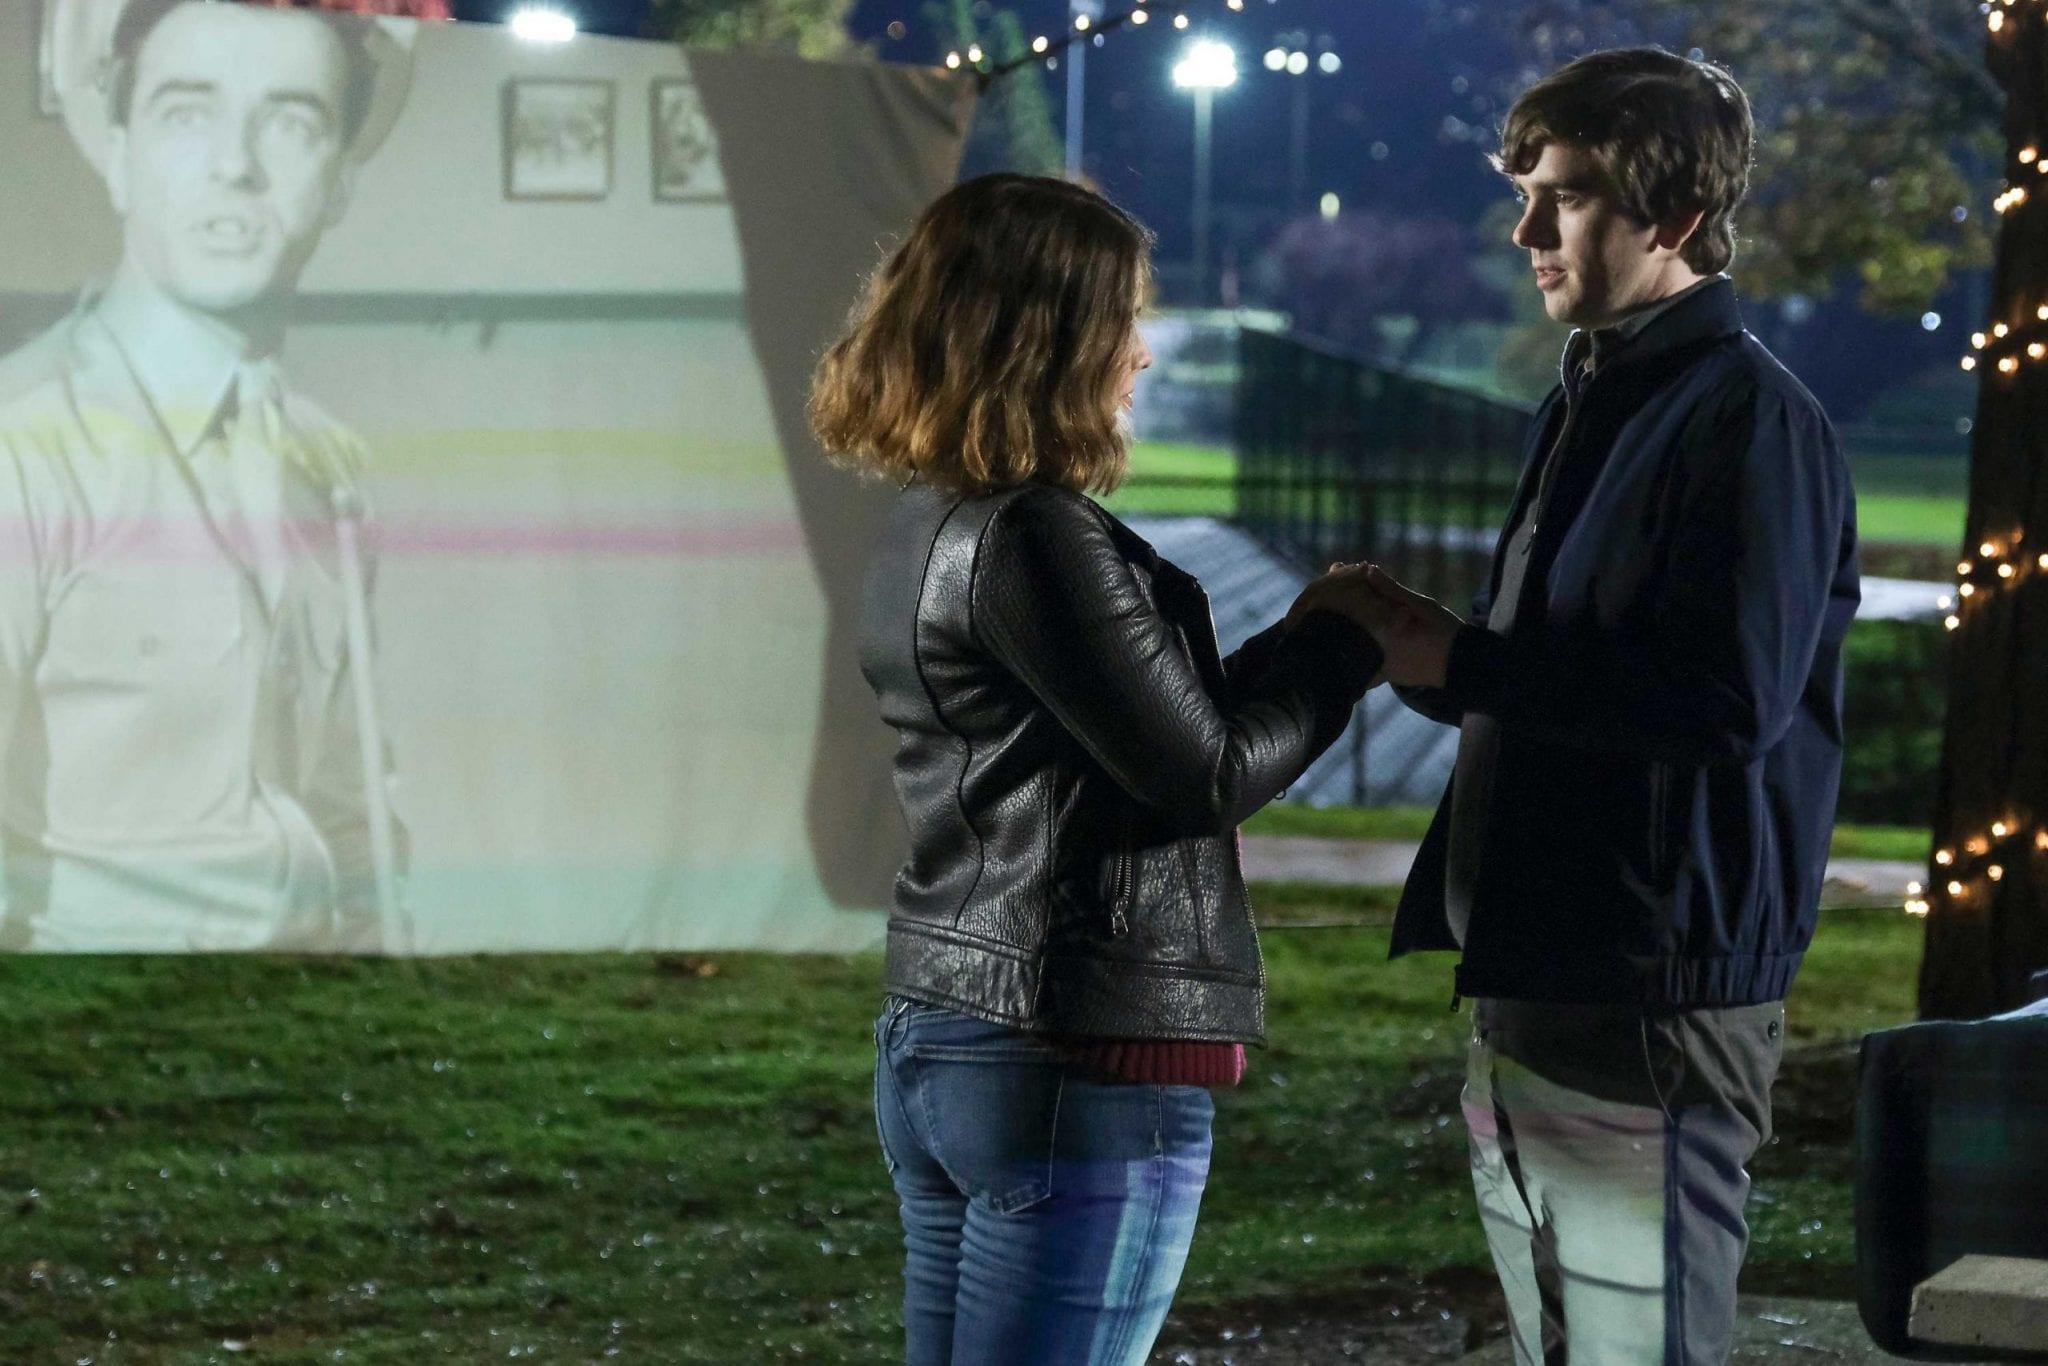 SerieTivu: The Good Doctor 4 quinta serata. Con protagonista Freddie Highmore nei panni del dottor Shaun Murphy, in prima visione assoluta su RaiDue